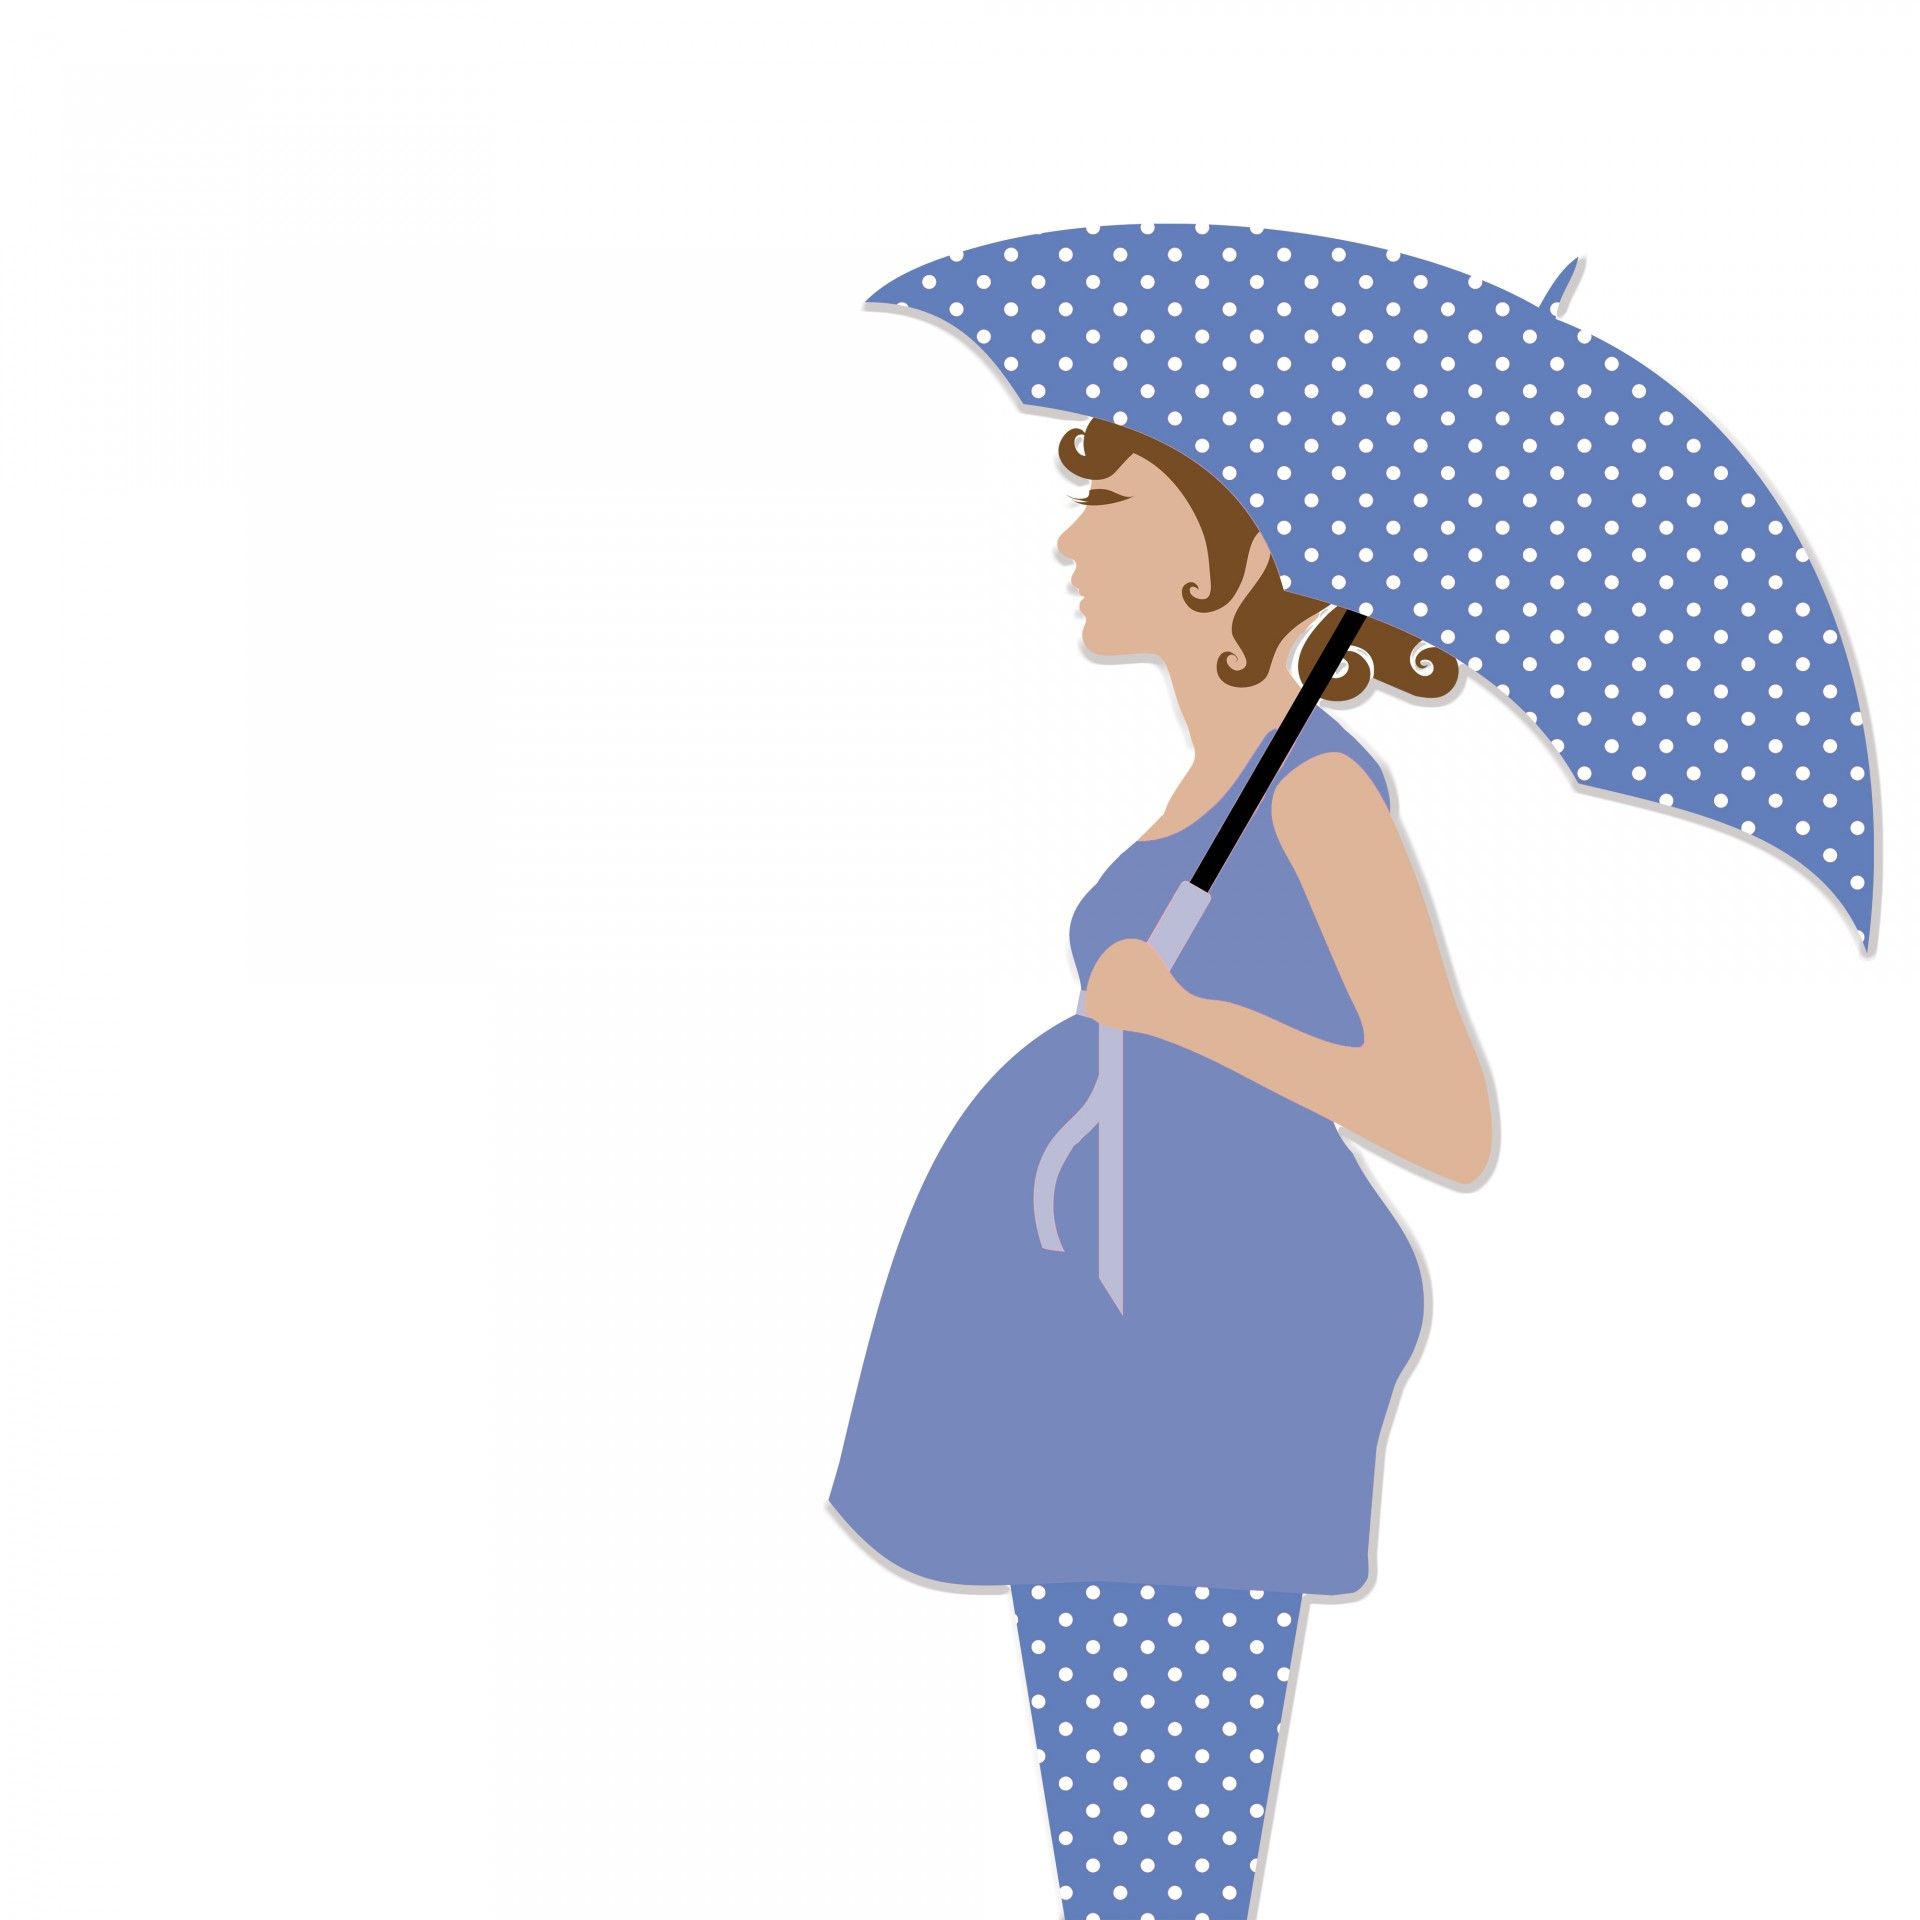 1920x1920 Pregnant Woman With Umbrella Free Stock Photo